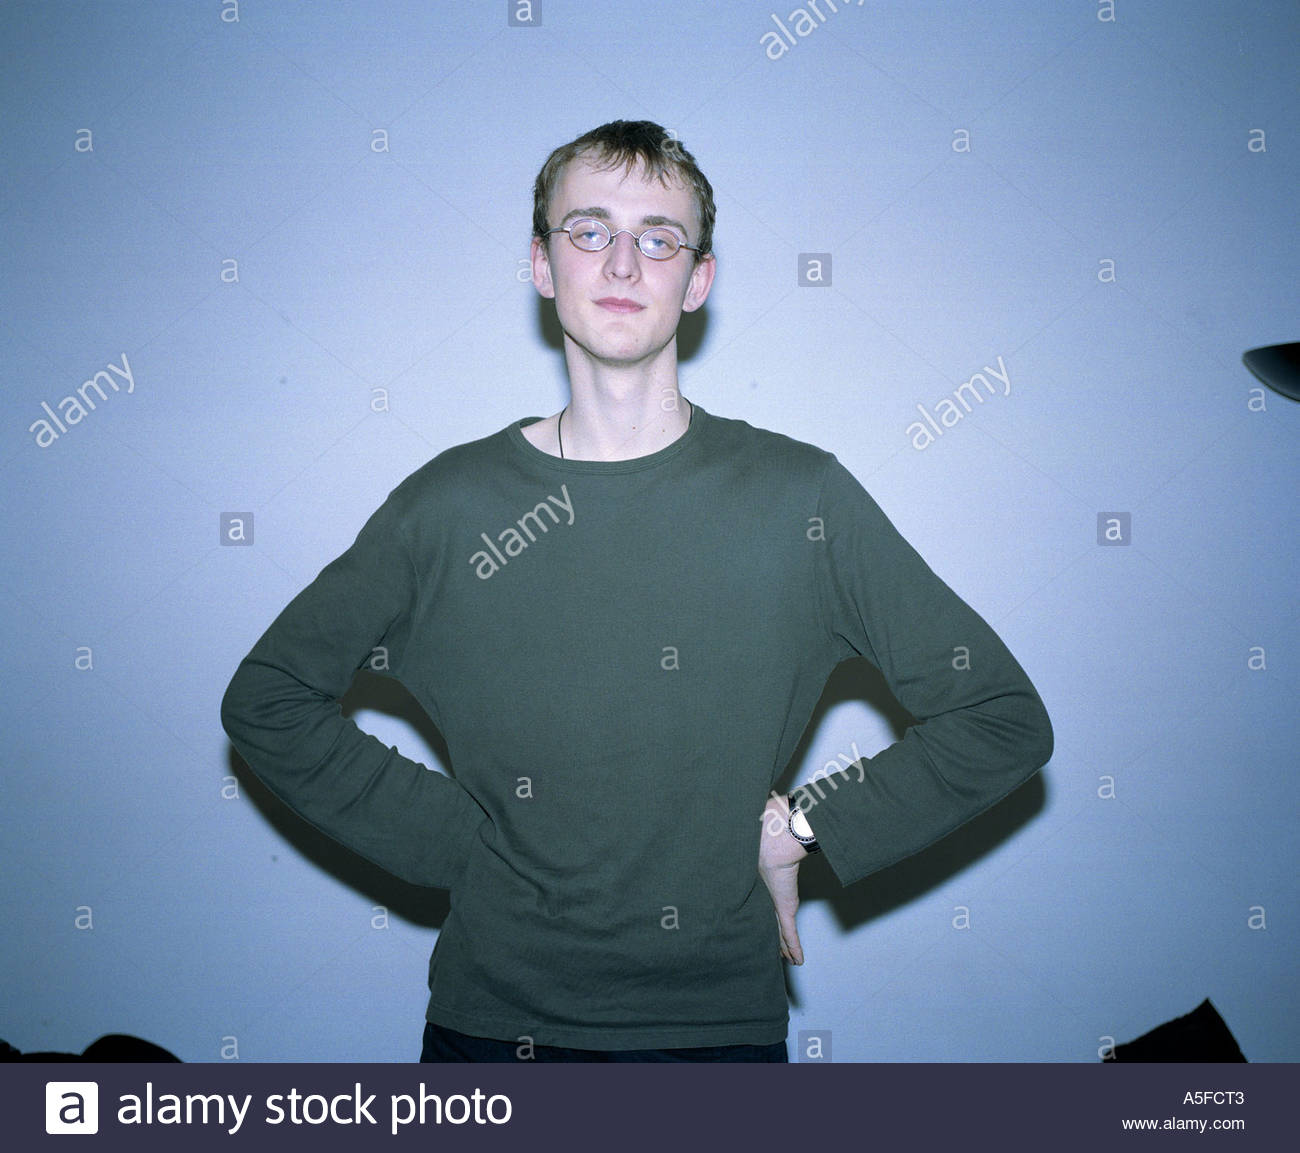 Junge Gay Boy Stockfoto, Bild: 6455426 - Alamy